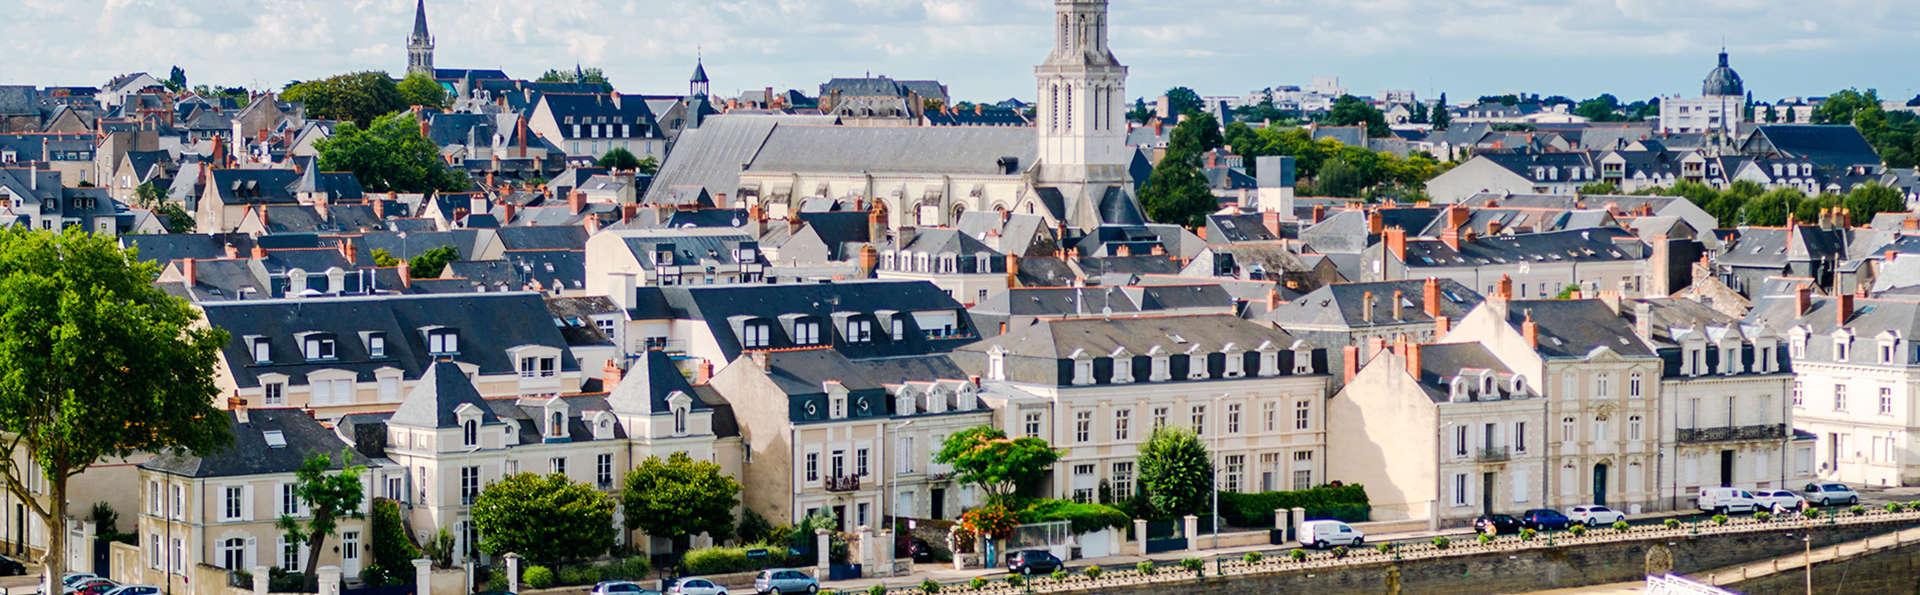 Best Western Hôtel d'Anjou - Edit_destination5.jpg